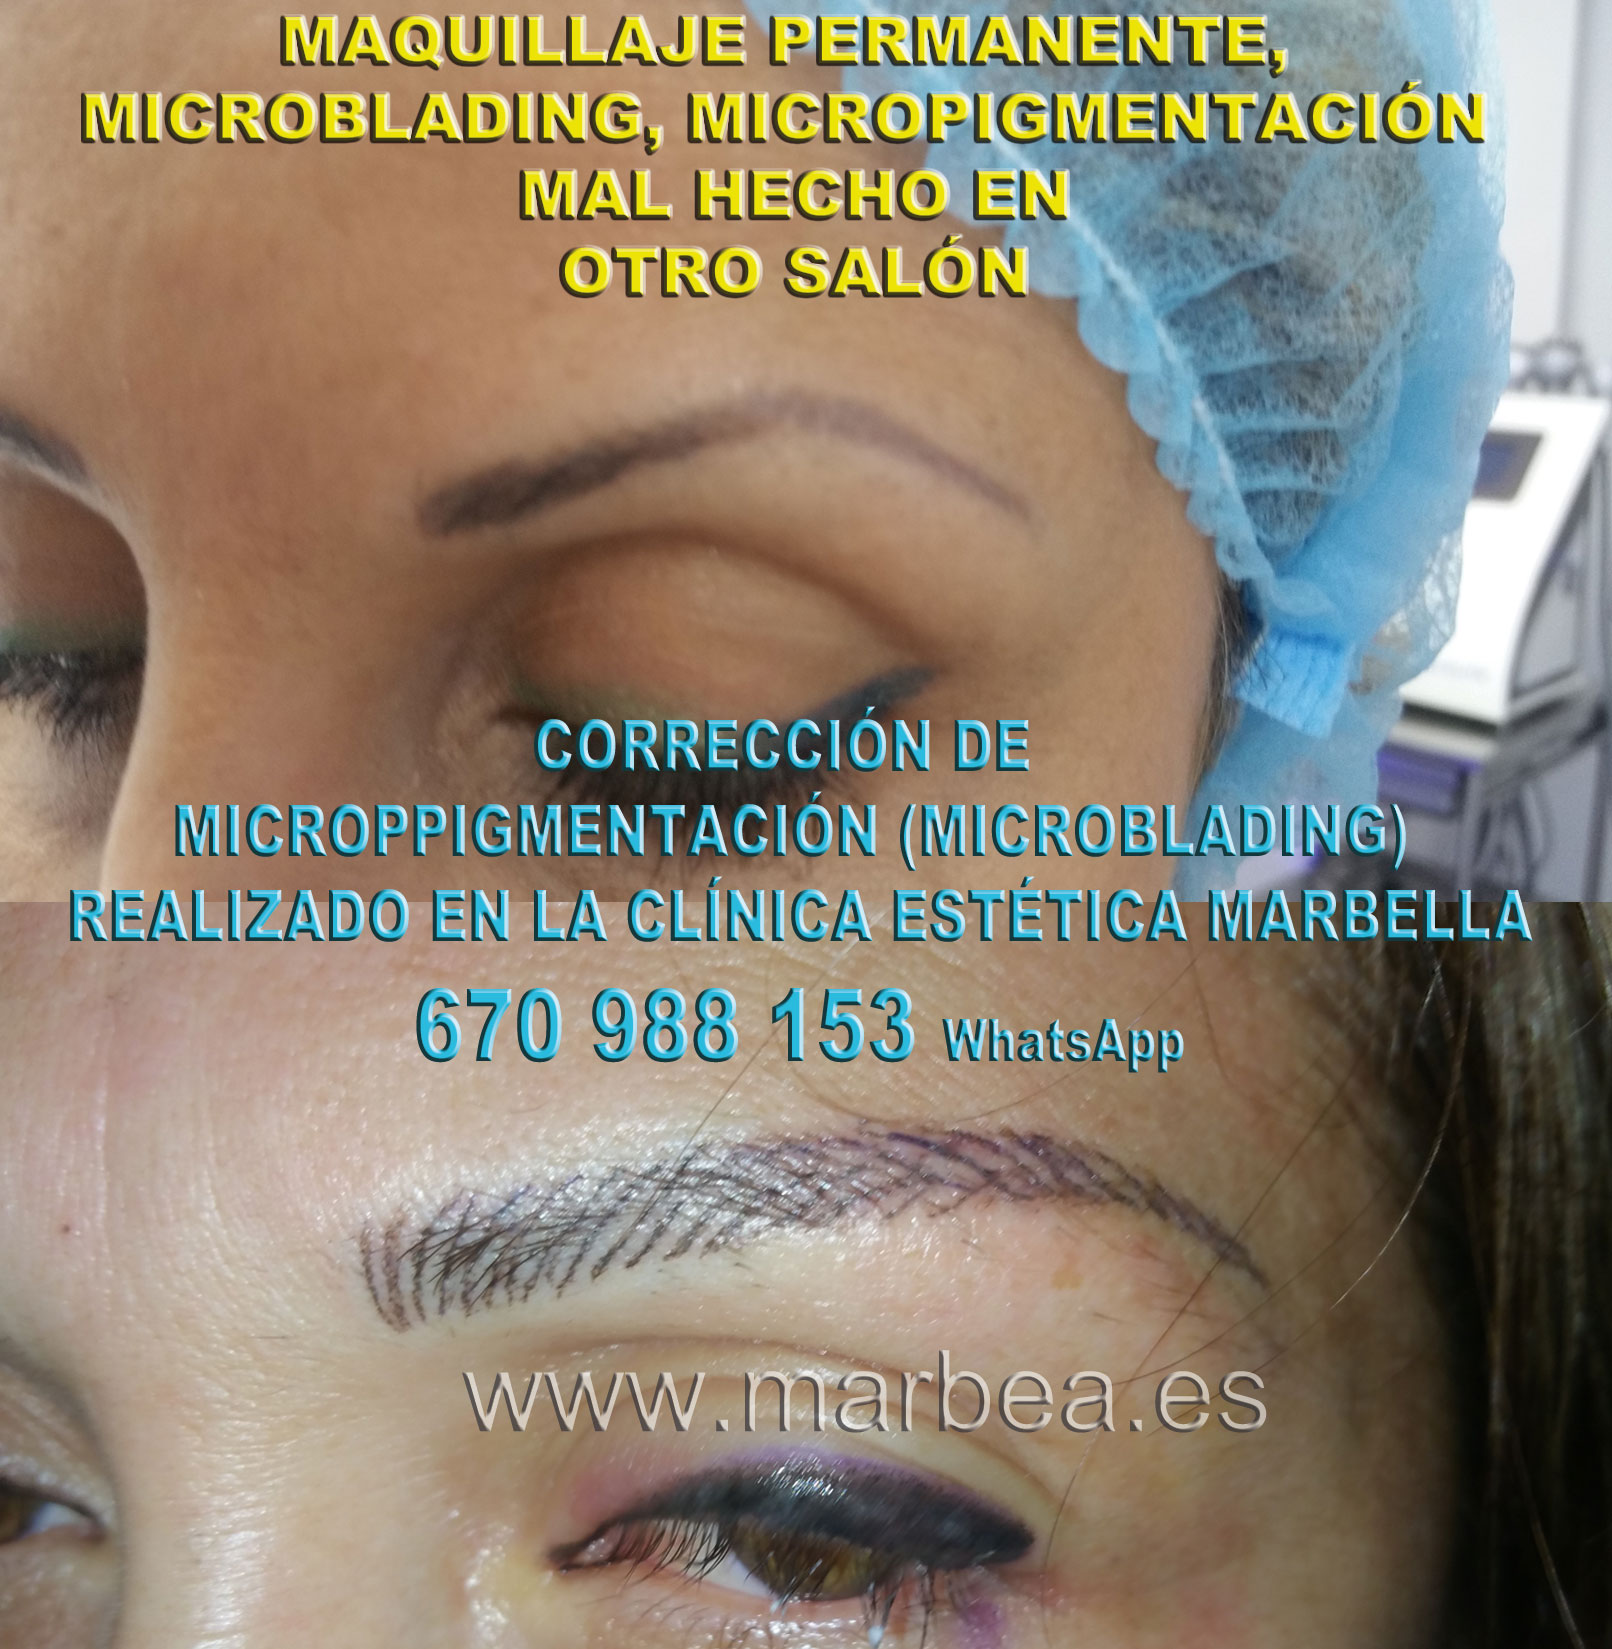 CORREGIR MICROPIGMENTACION MAL HECHA clínica estética maquillaje semipermanente entrega micropigmentacion correctiva de cejas,micropigmentación correctiva cejas mal hecha